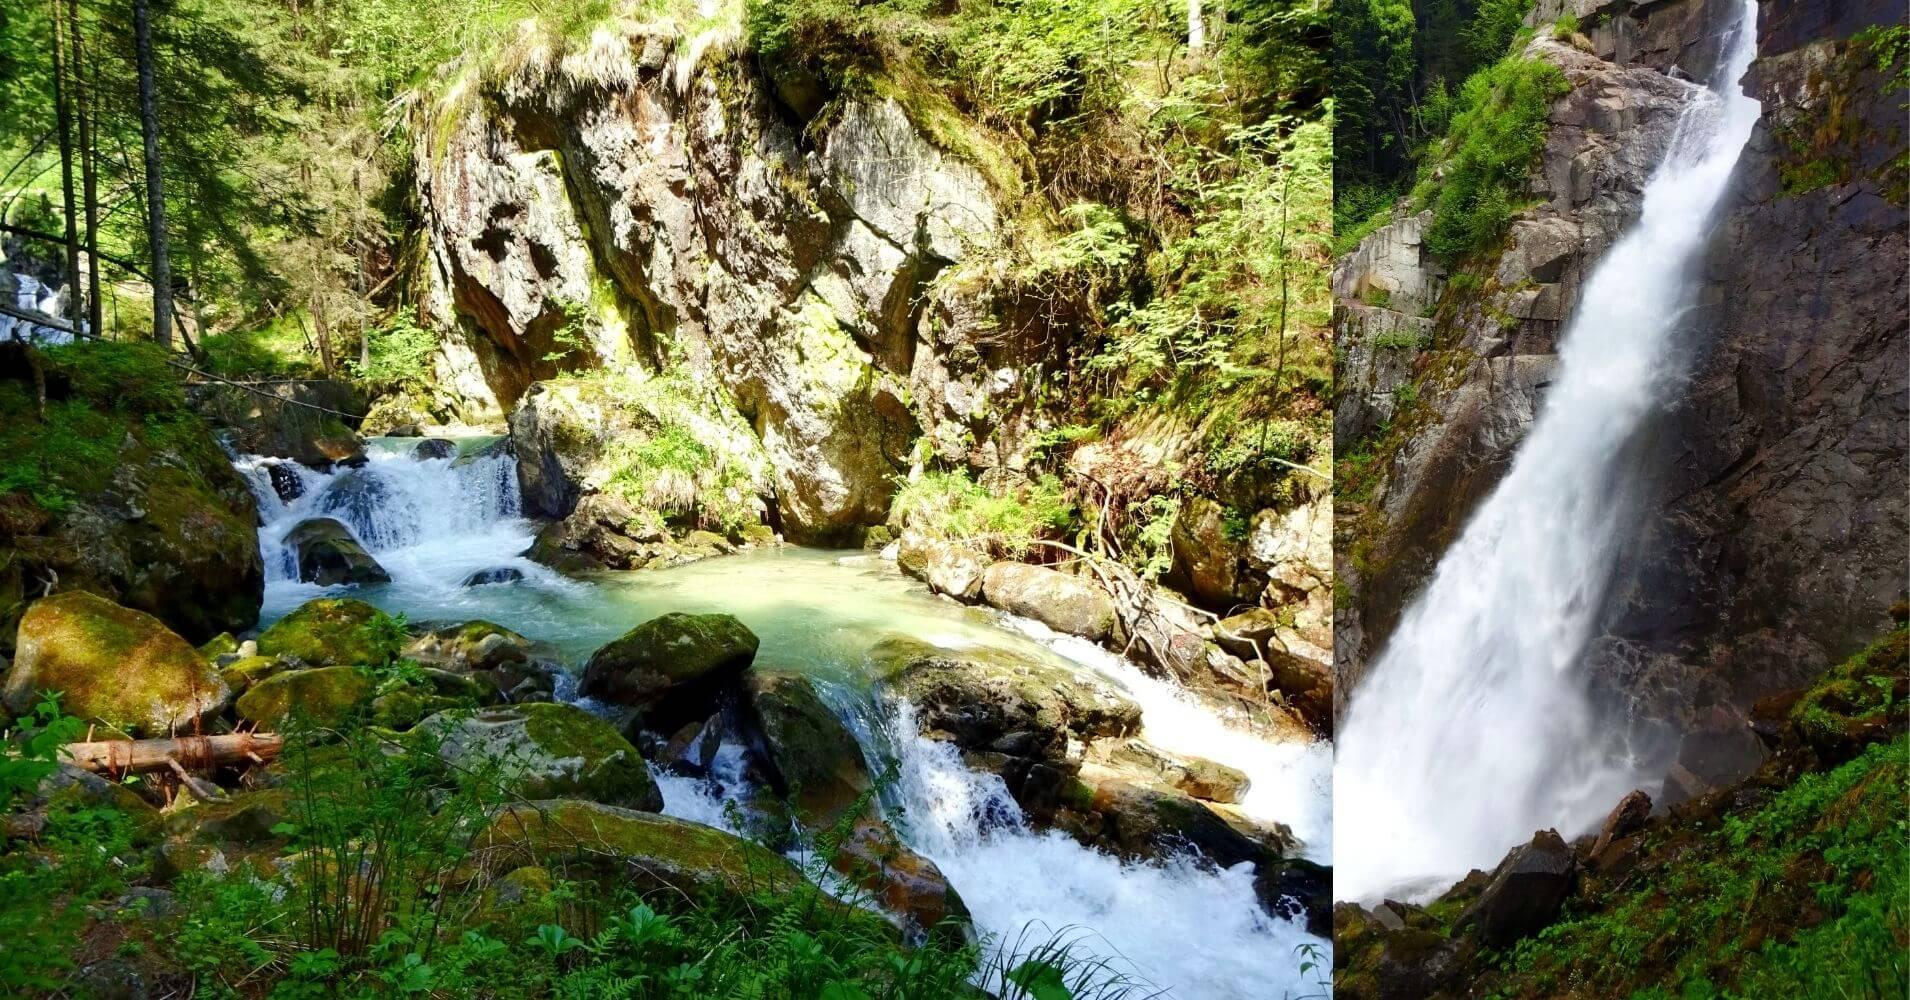 Parque Natural Adamello Brenta. Cascada de Lares. Madona di Campiglio. Véneto. Italia.